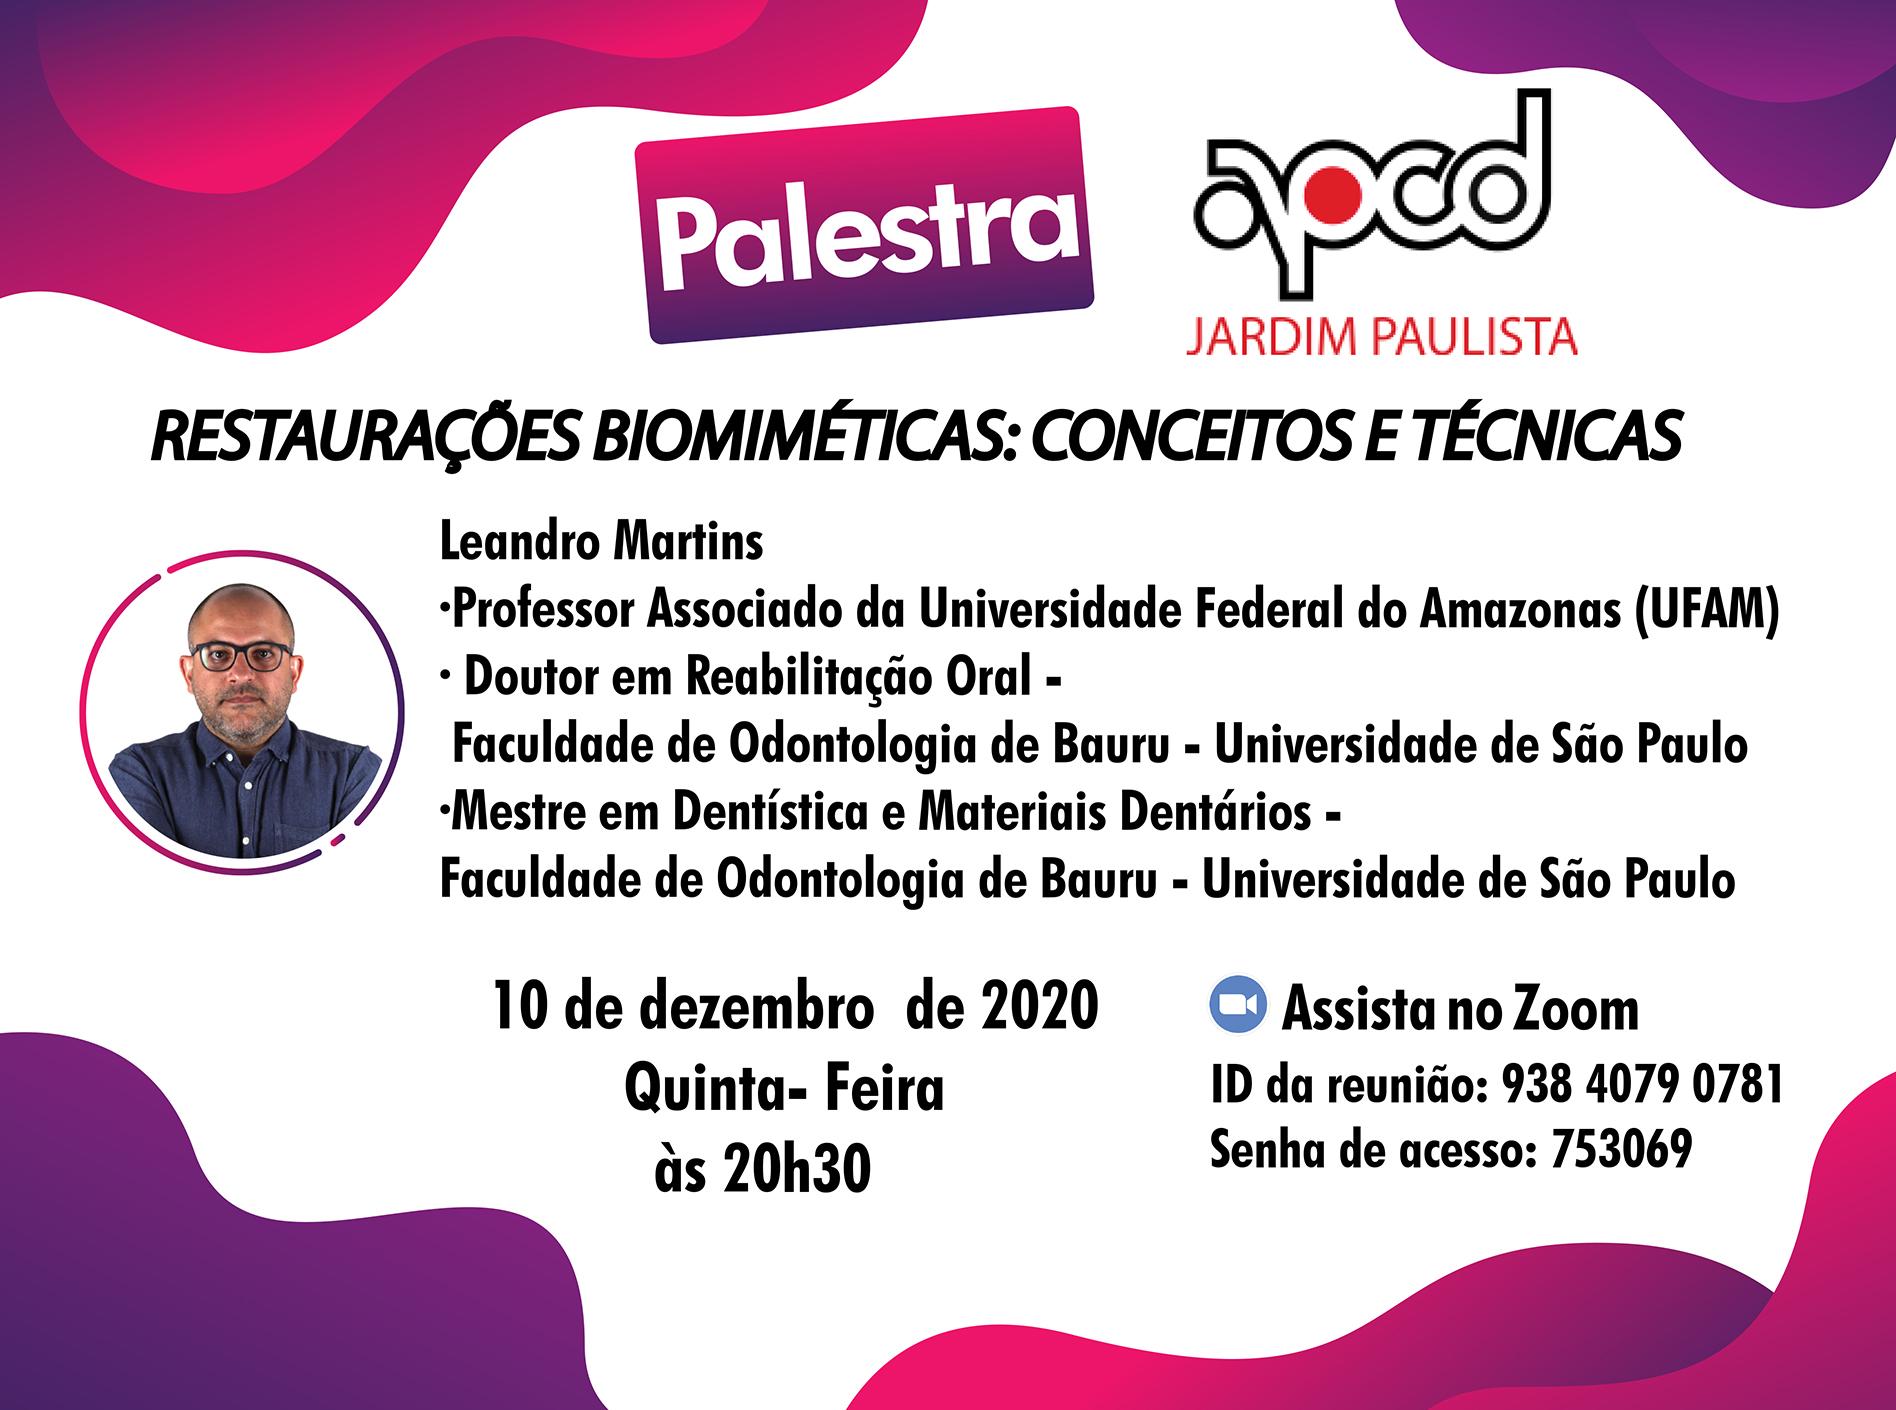 Leandro Martins01